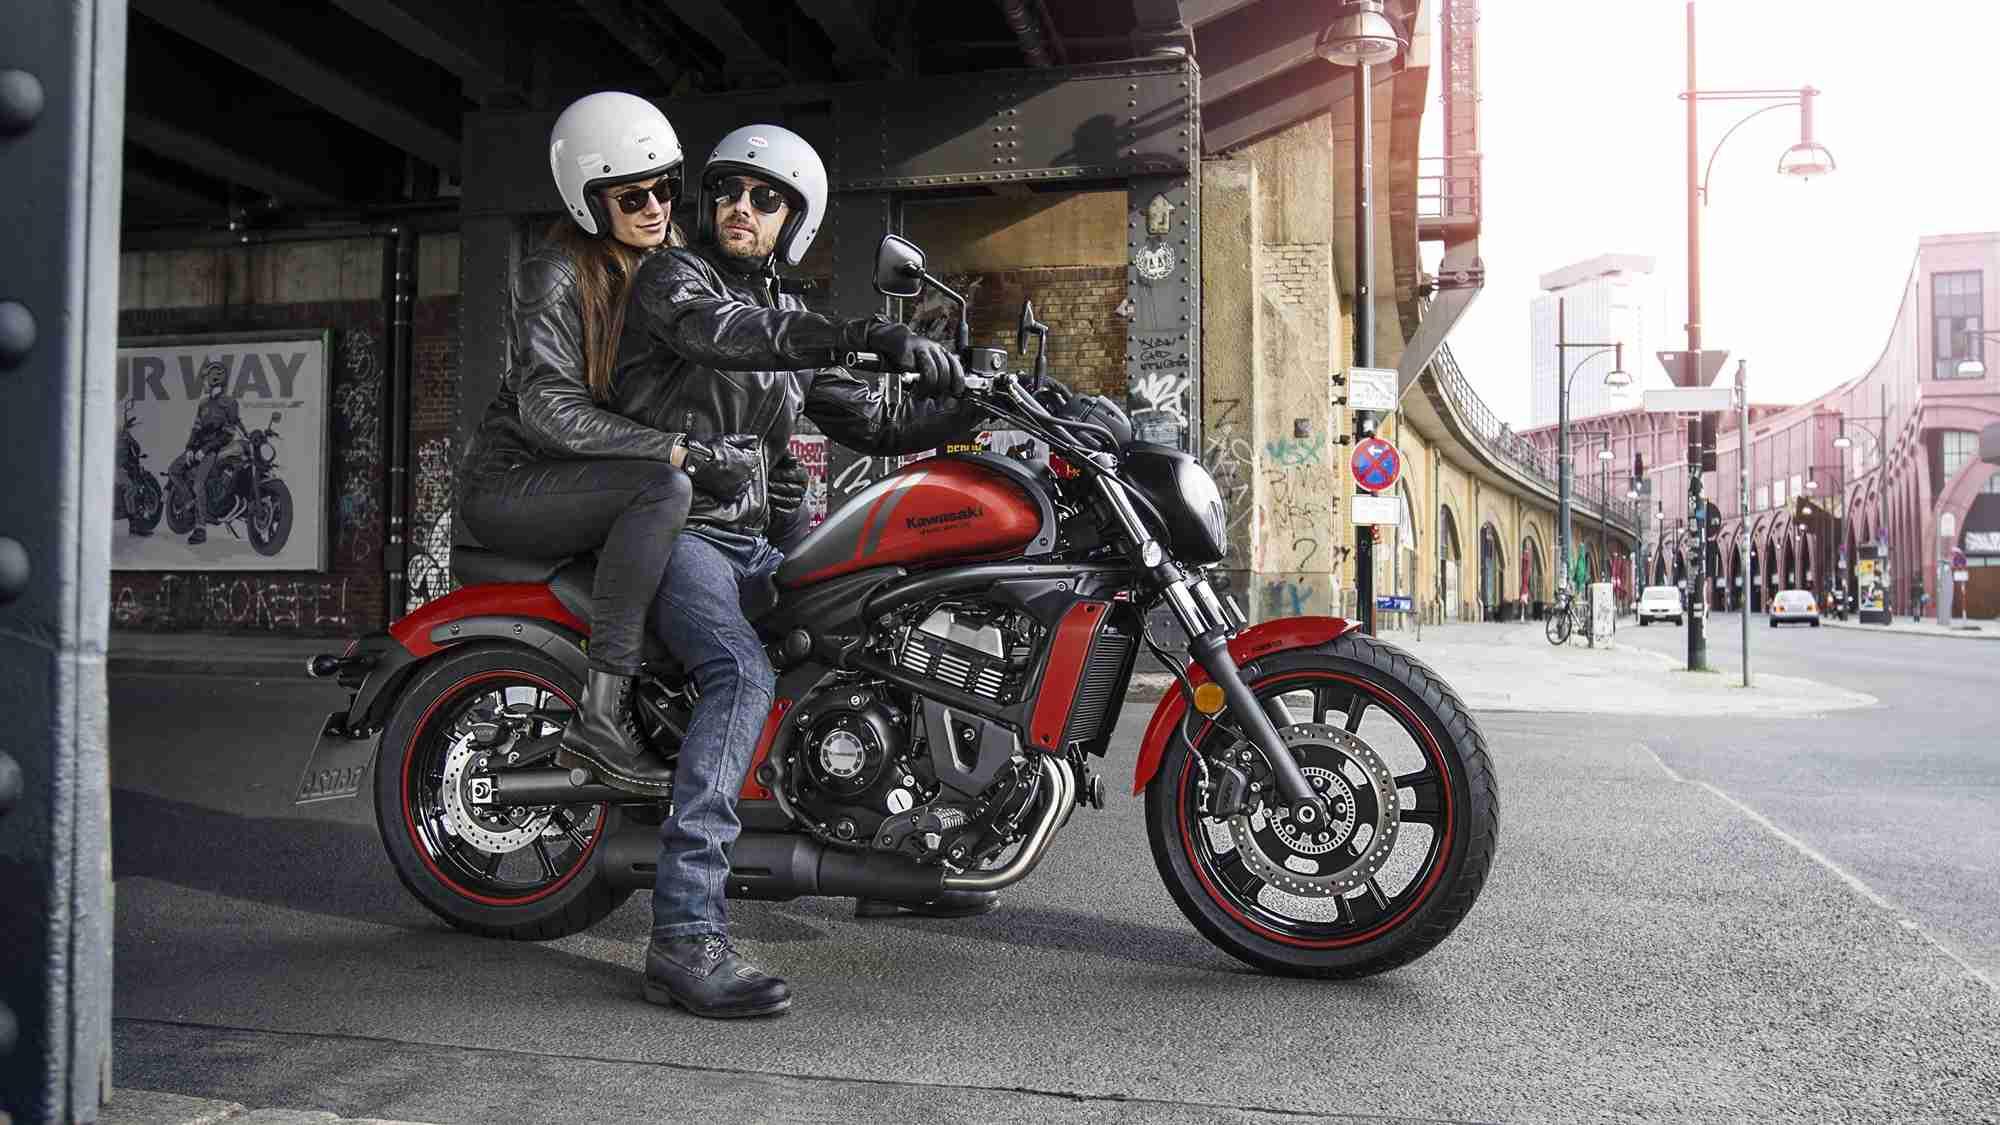 Yzf 1000 Side By Side Yzf R1m 2017 Motorrder Yamaha Motor